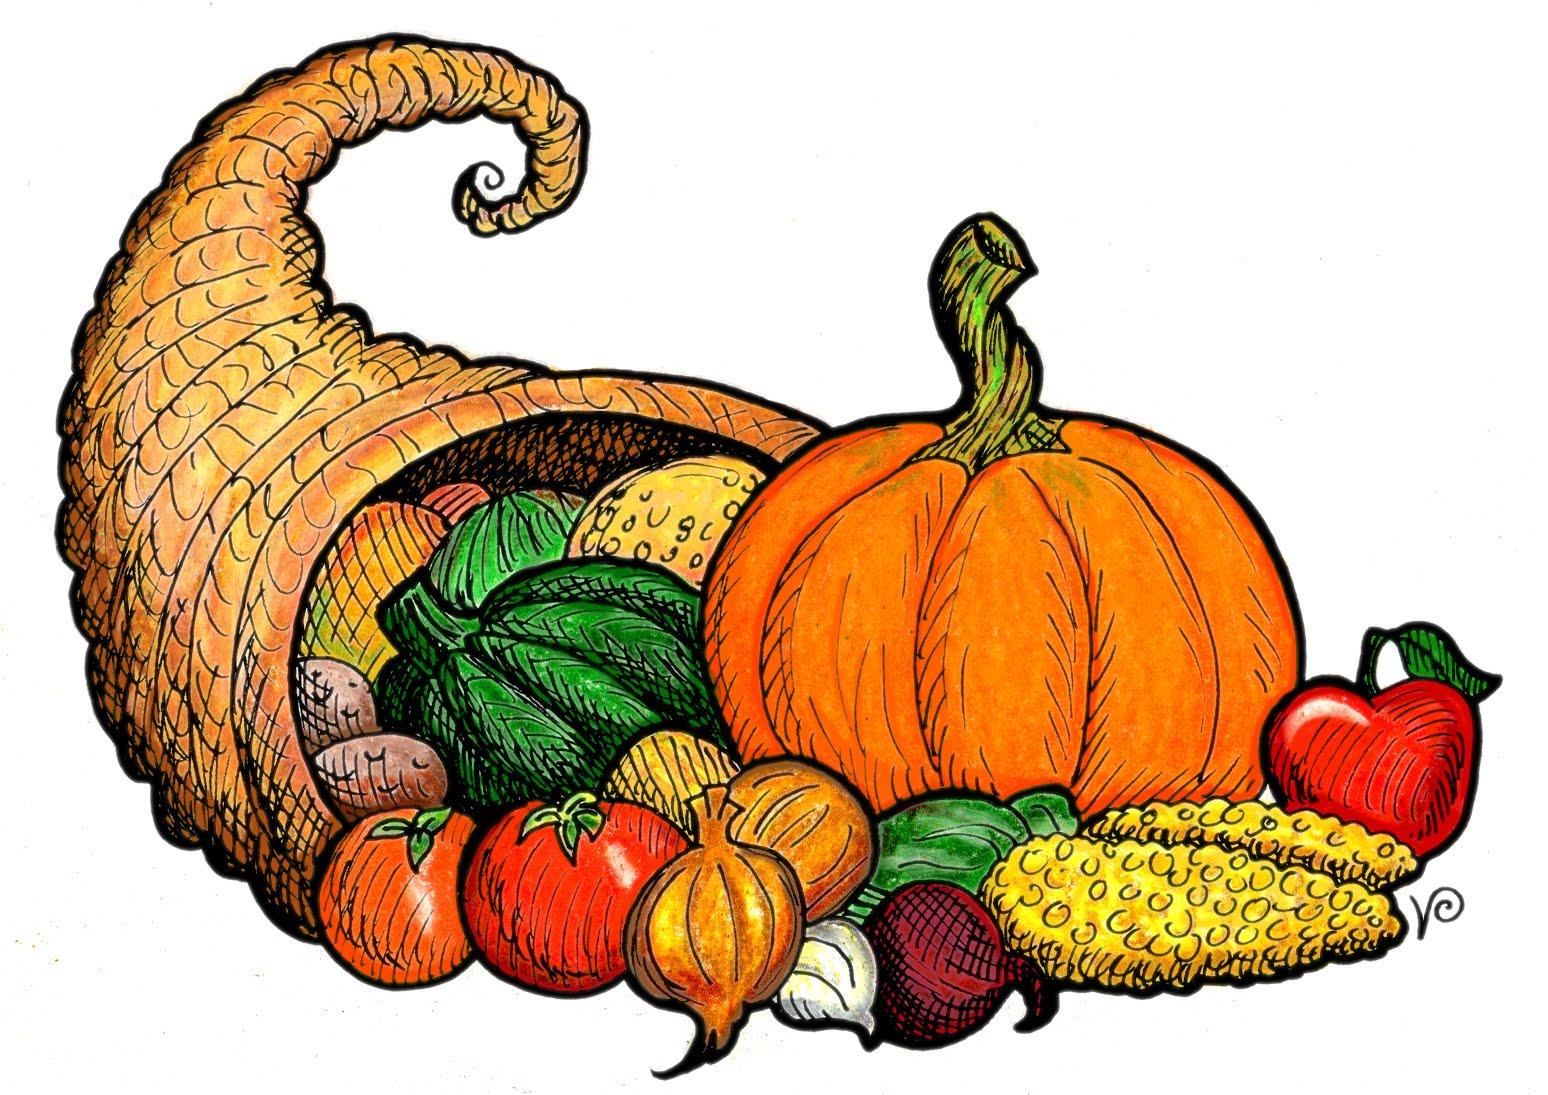 "Gourd clipart thanksgiving food Emmersion thanksgiving clipart november """